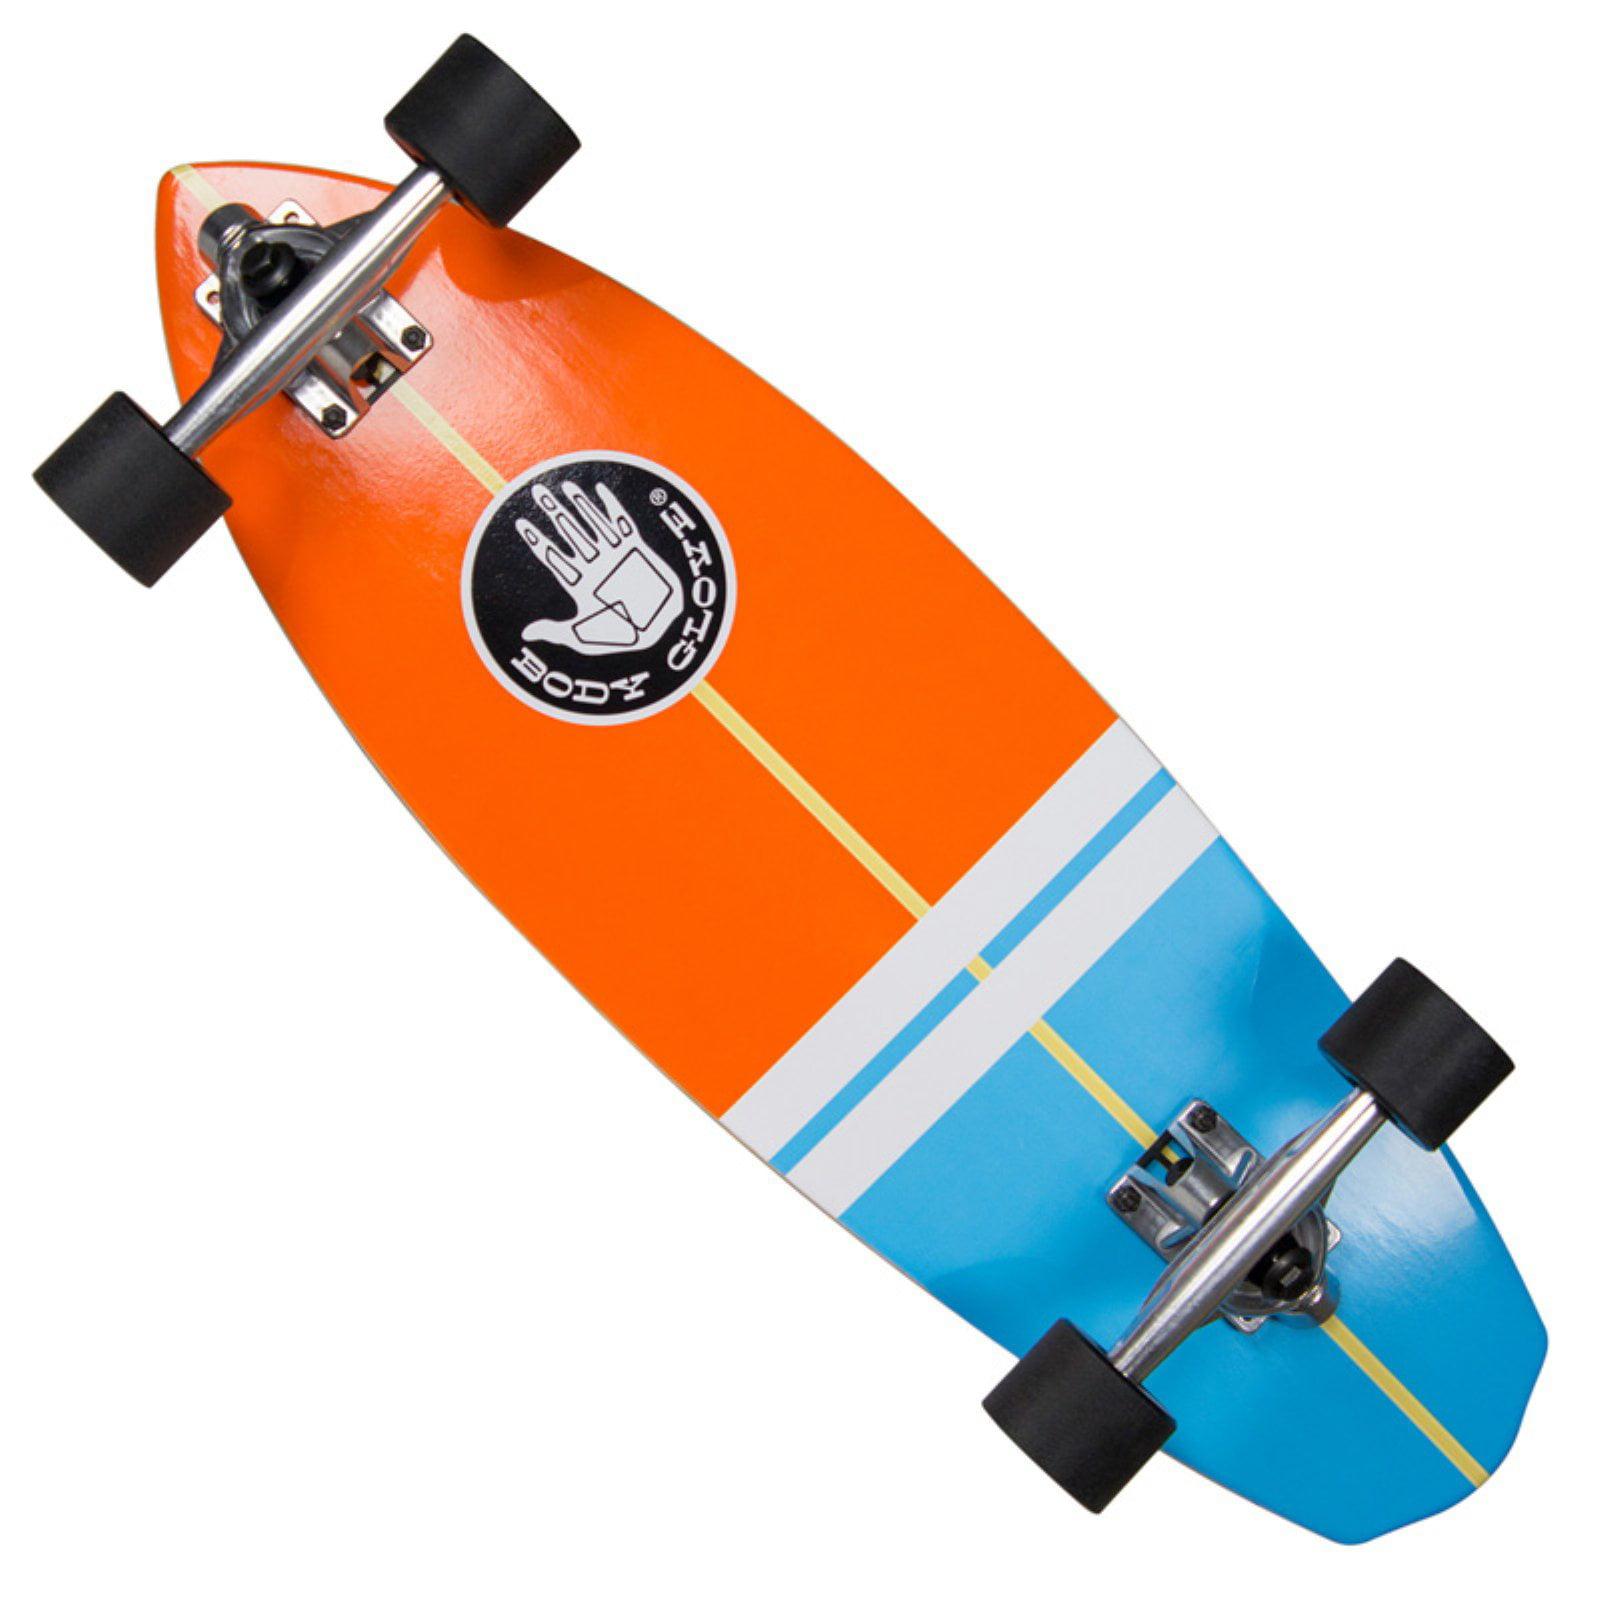 Body Glove Surf Slide 28 in. High Performance Longboard Cruiser Skateboard by Overstock